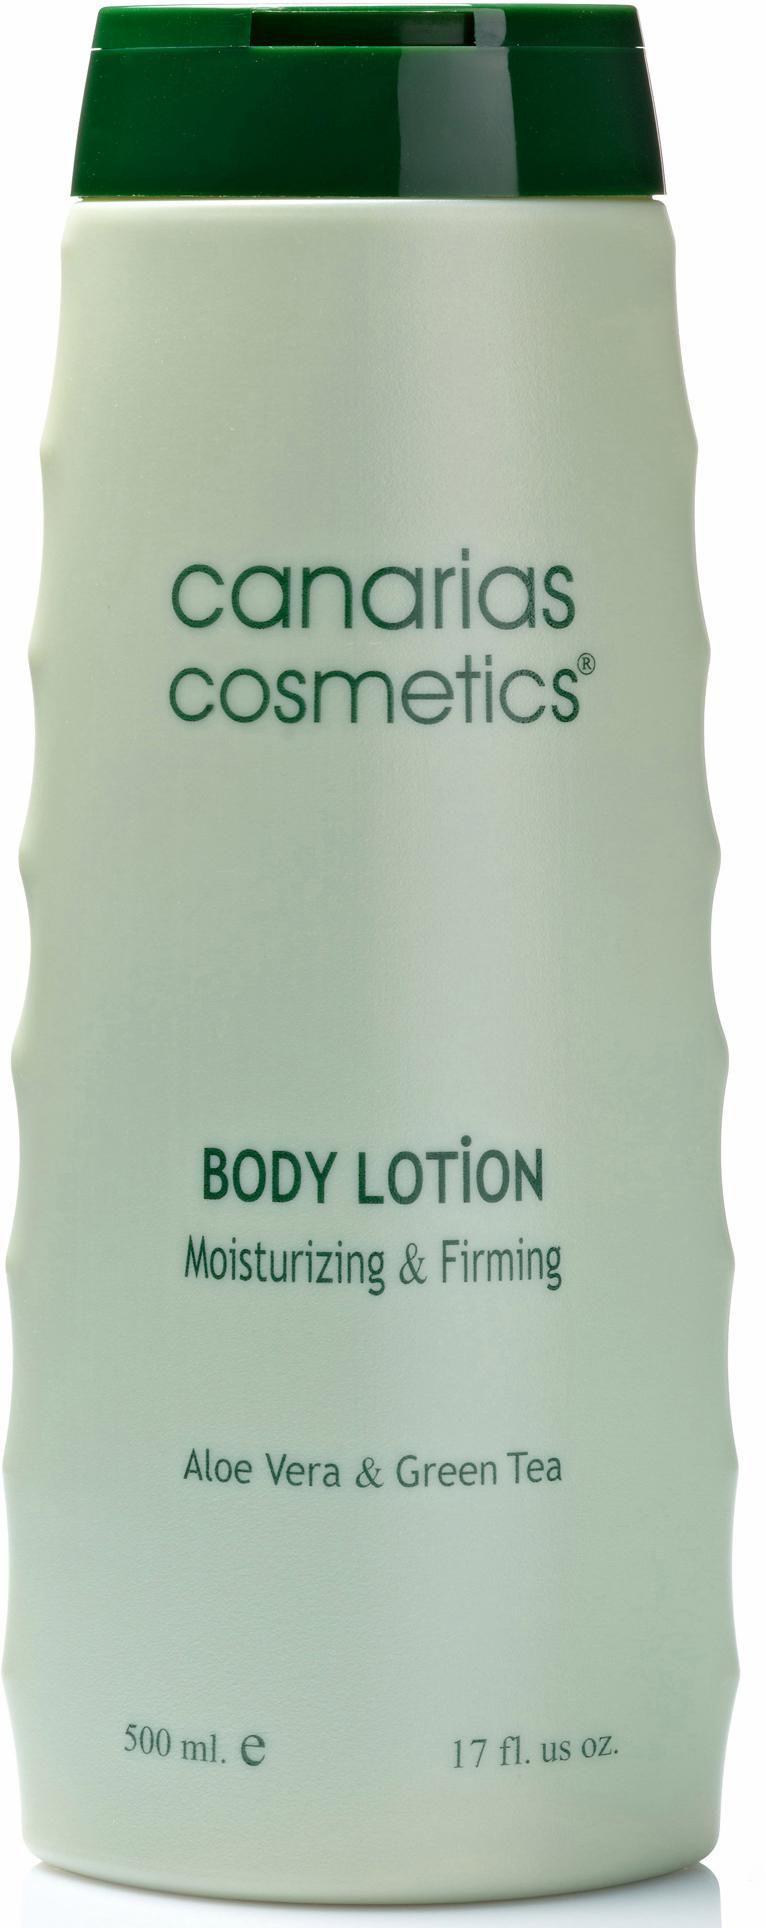 CANARIAS COSMETICS Canarias Cosmetics, »Dermo Aloe«, Feuchtigkeitsspendende und straffende Bodylotion